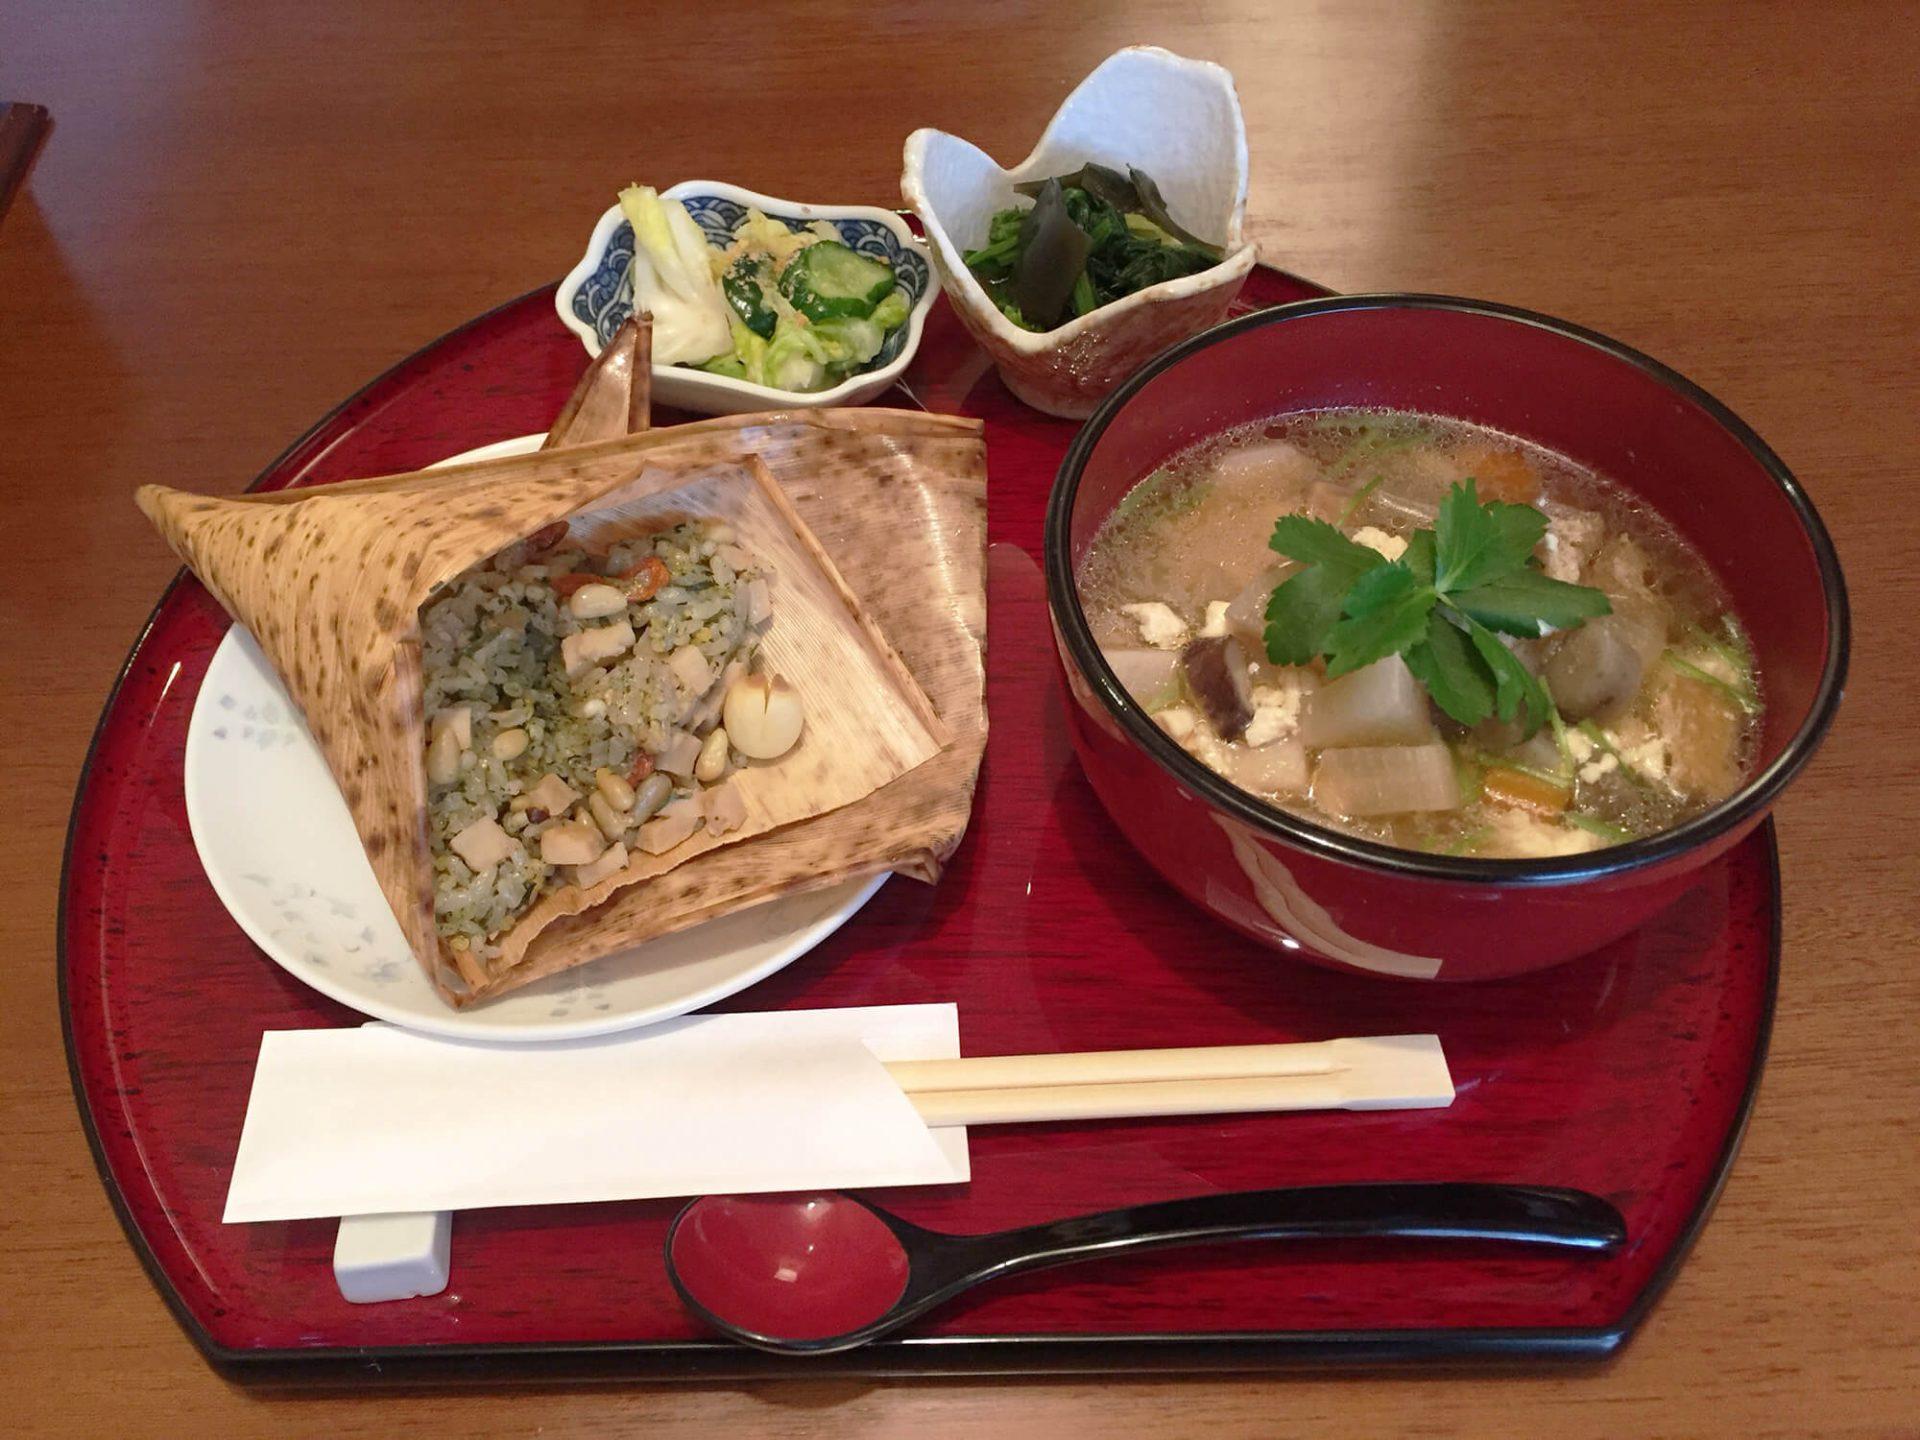 Shinshin Tei Eating Buddhist Food In Kakuozan Kawaii Aichi